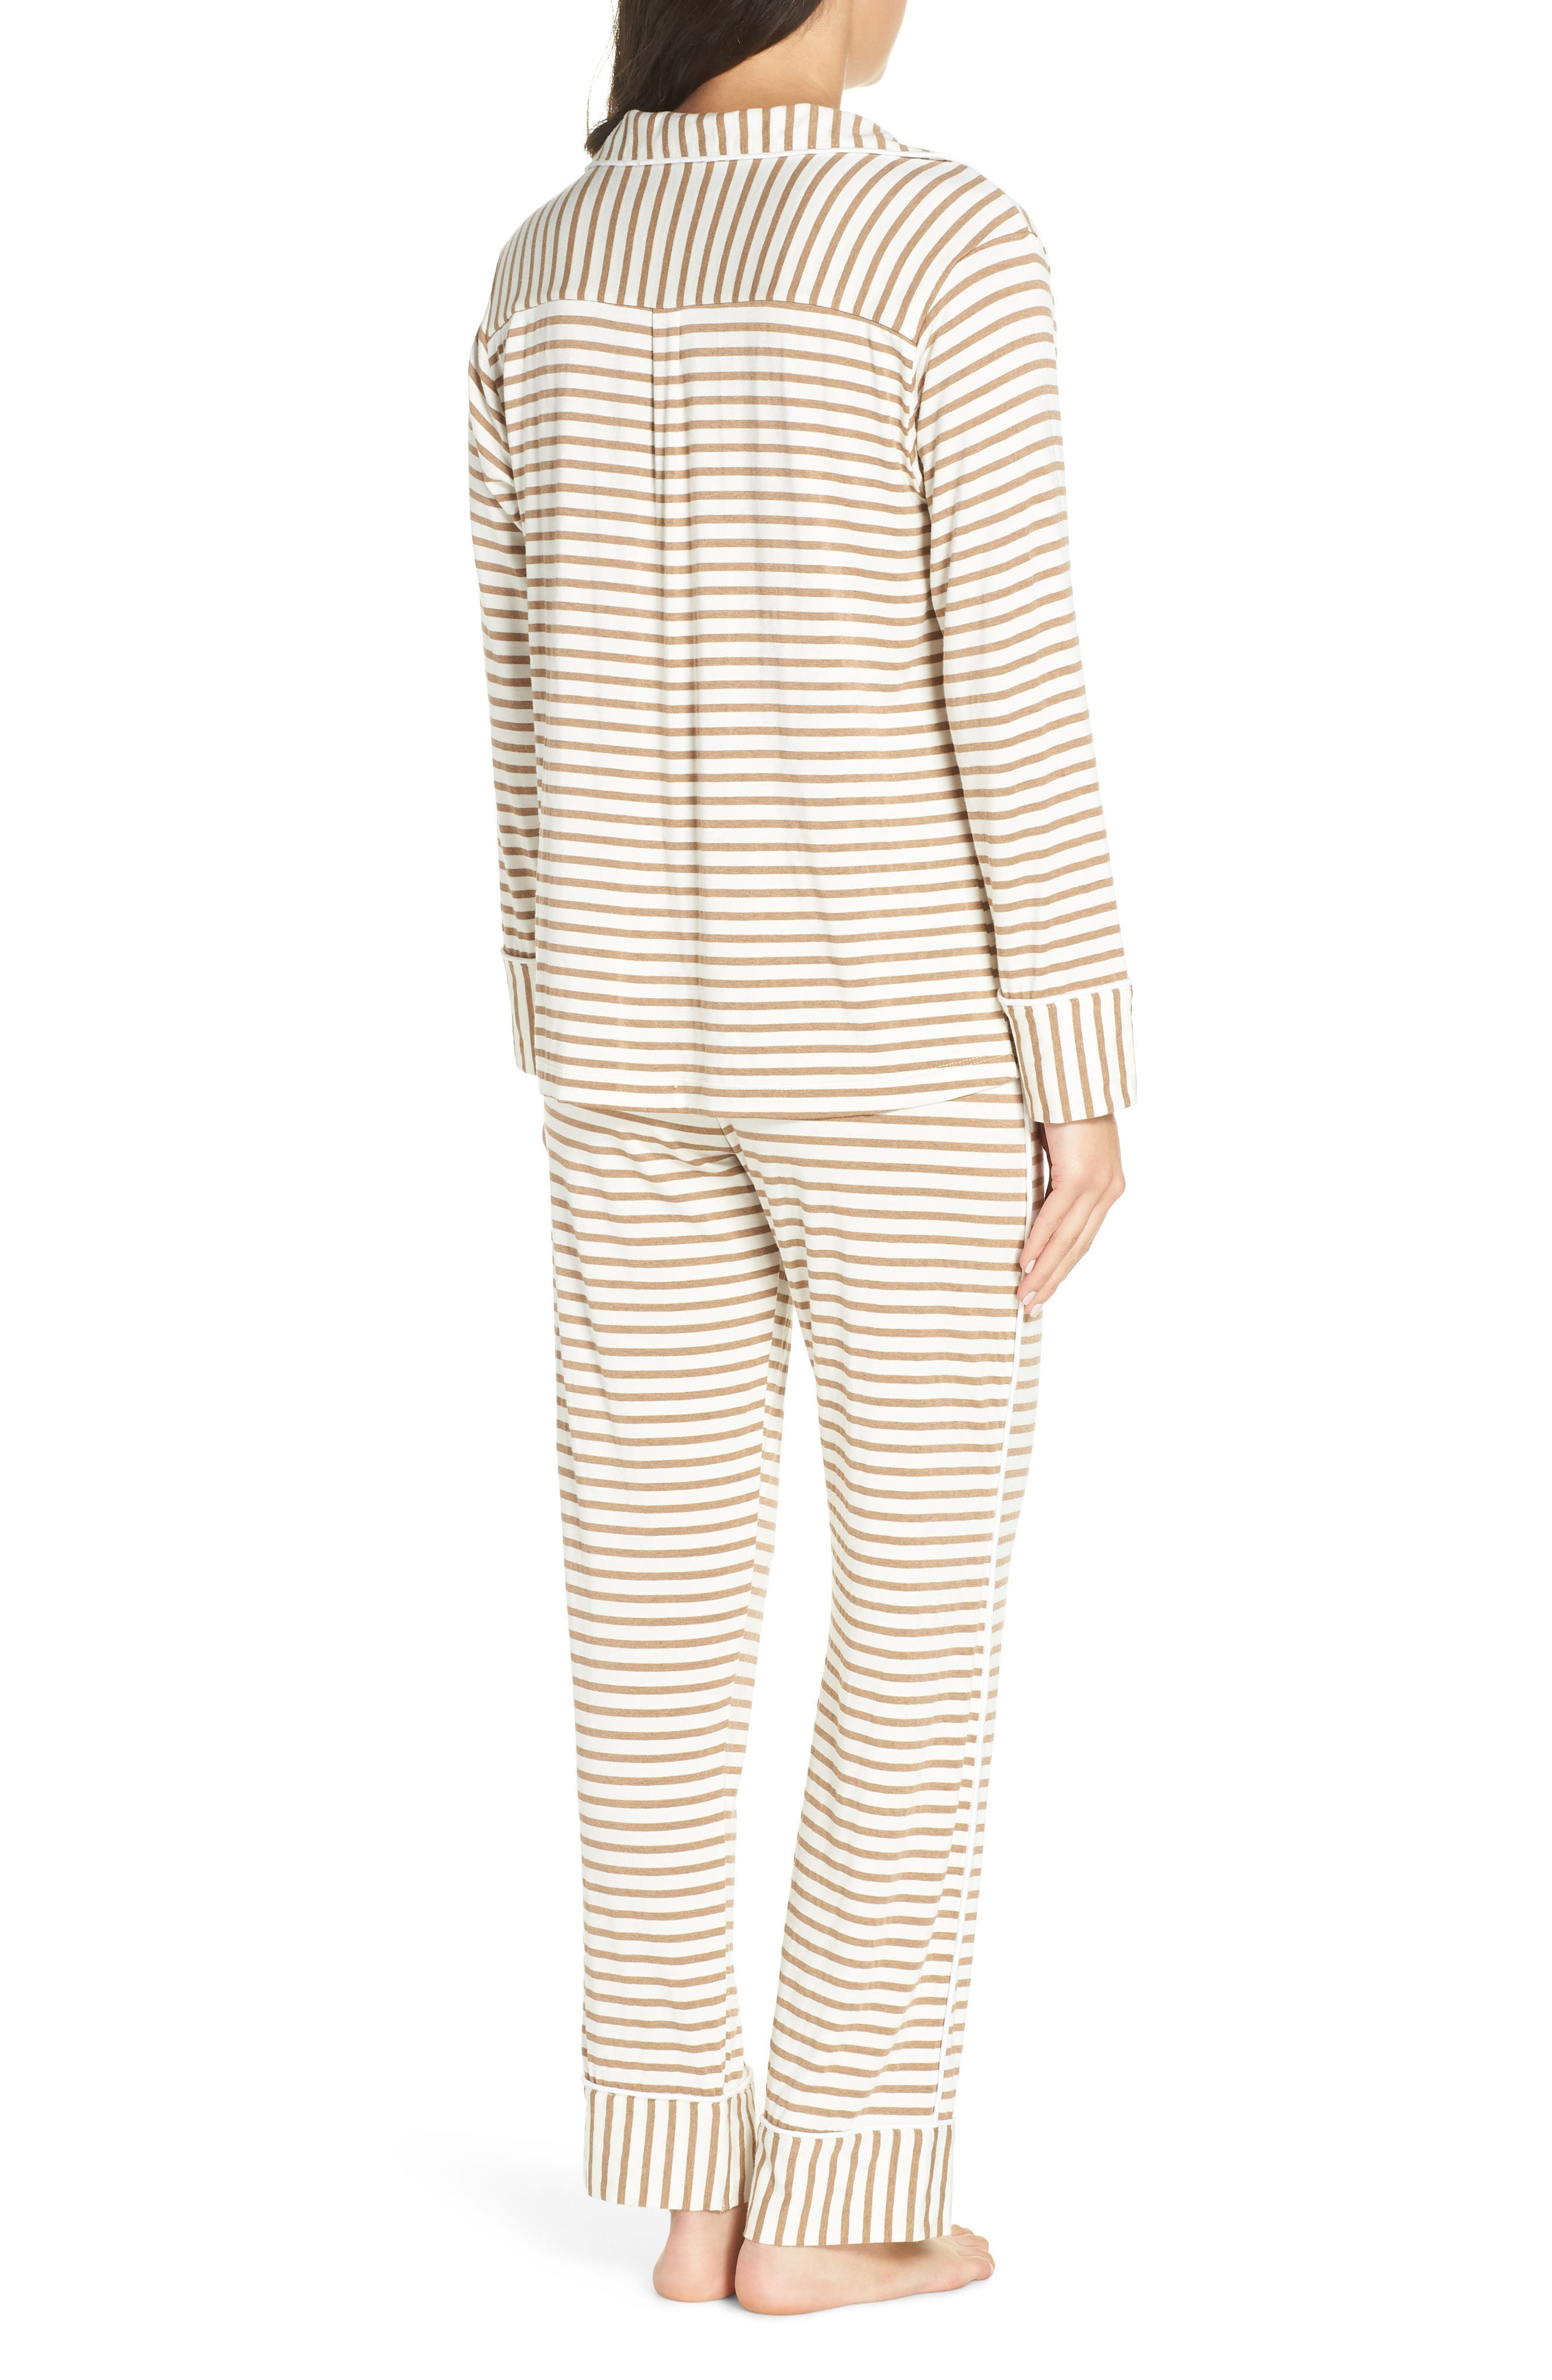 Monaco Pajamas,                             Alternate thumbnail 2, color,                             CAMEL STRIPE